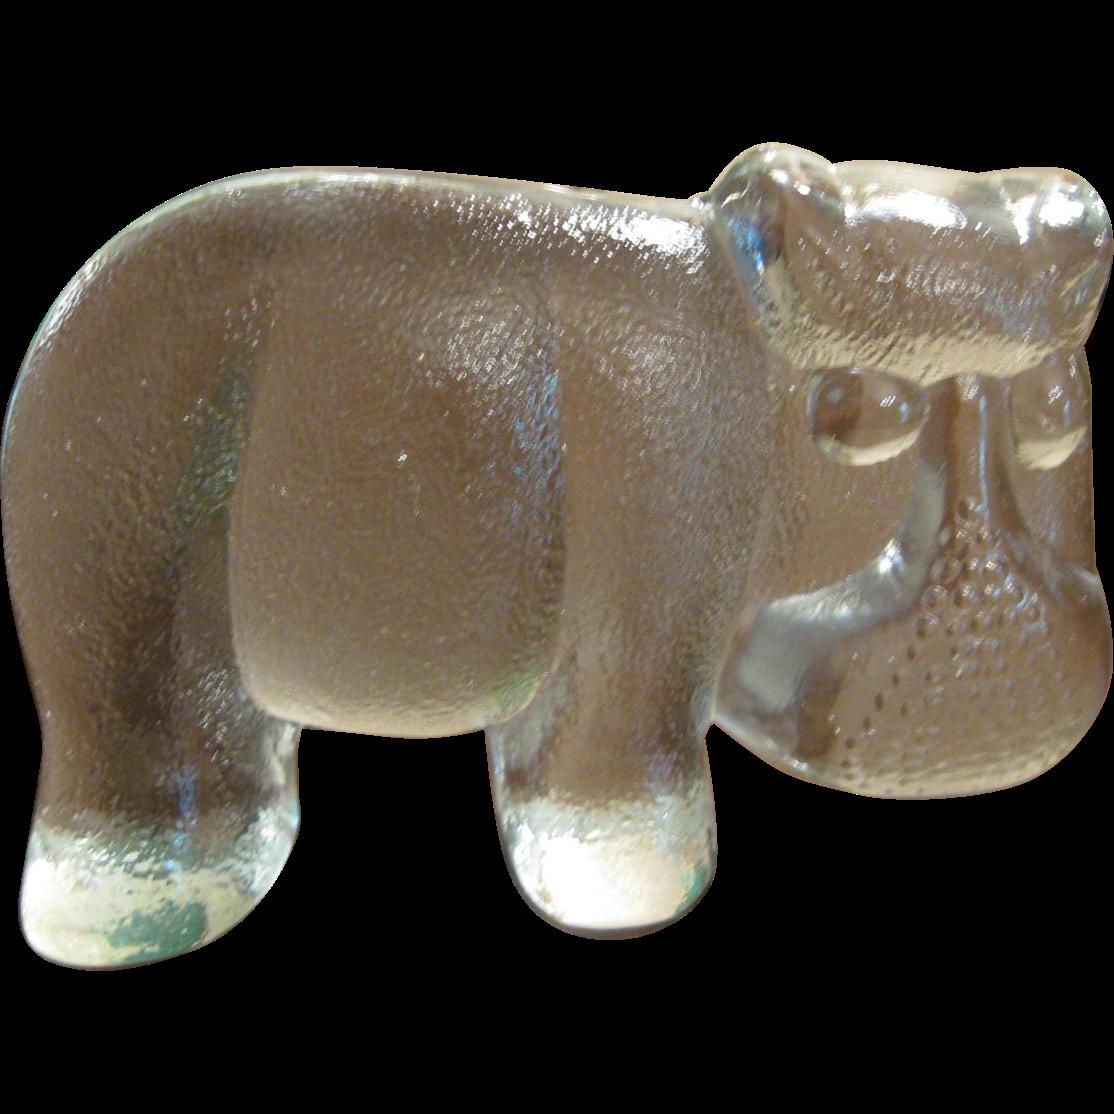 Kosta Boda Sweden Art Glass Hippo Paperweight